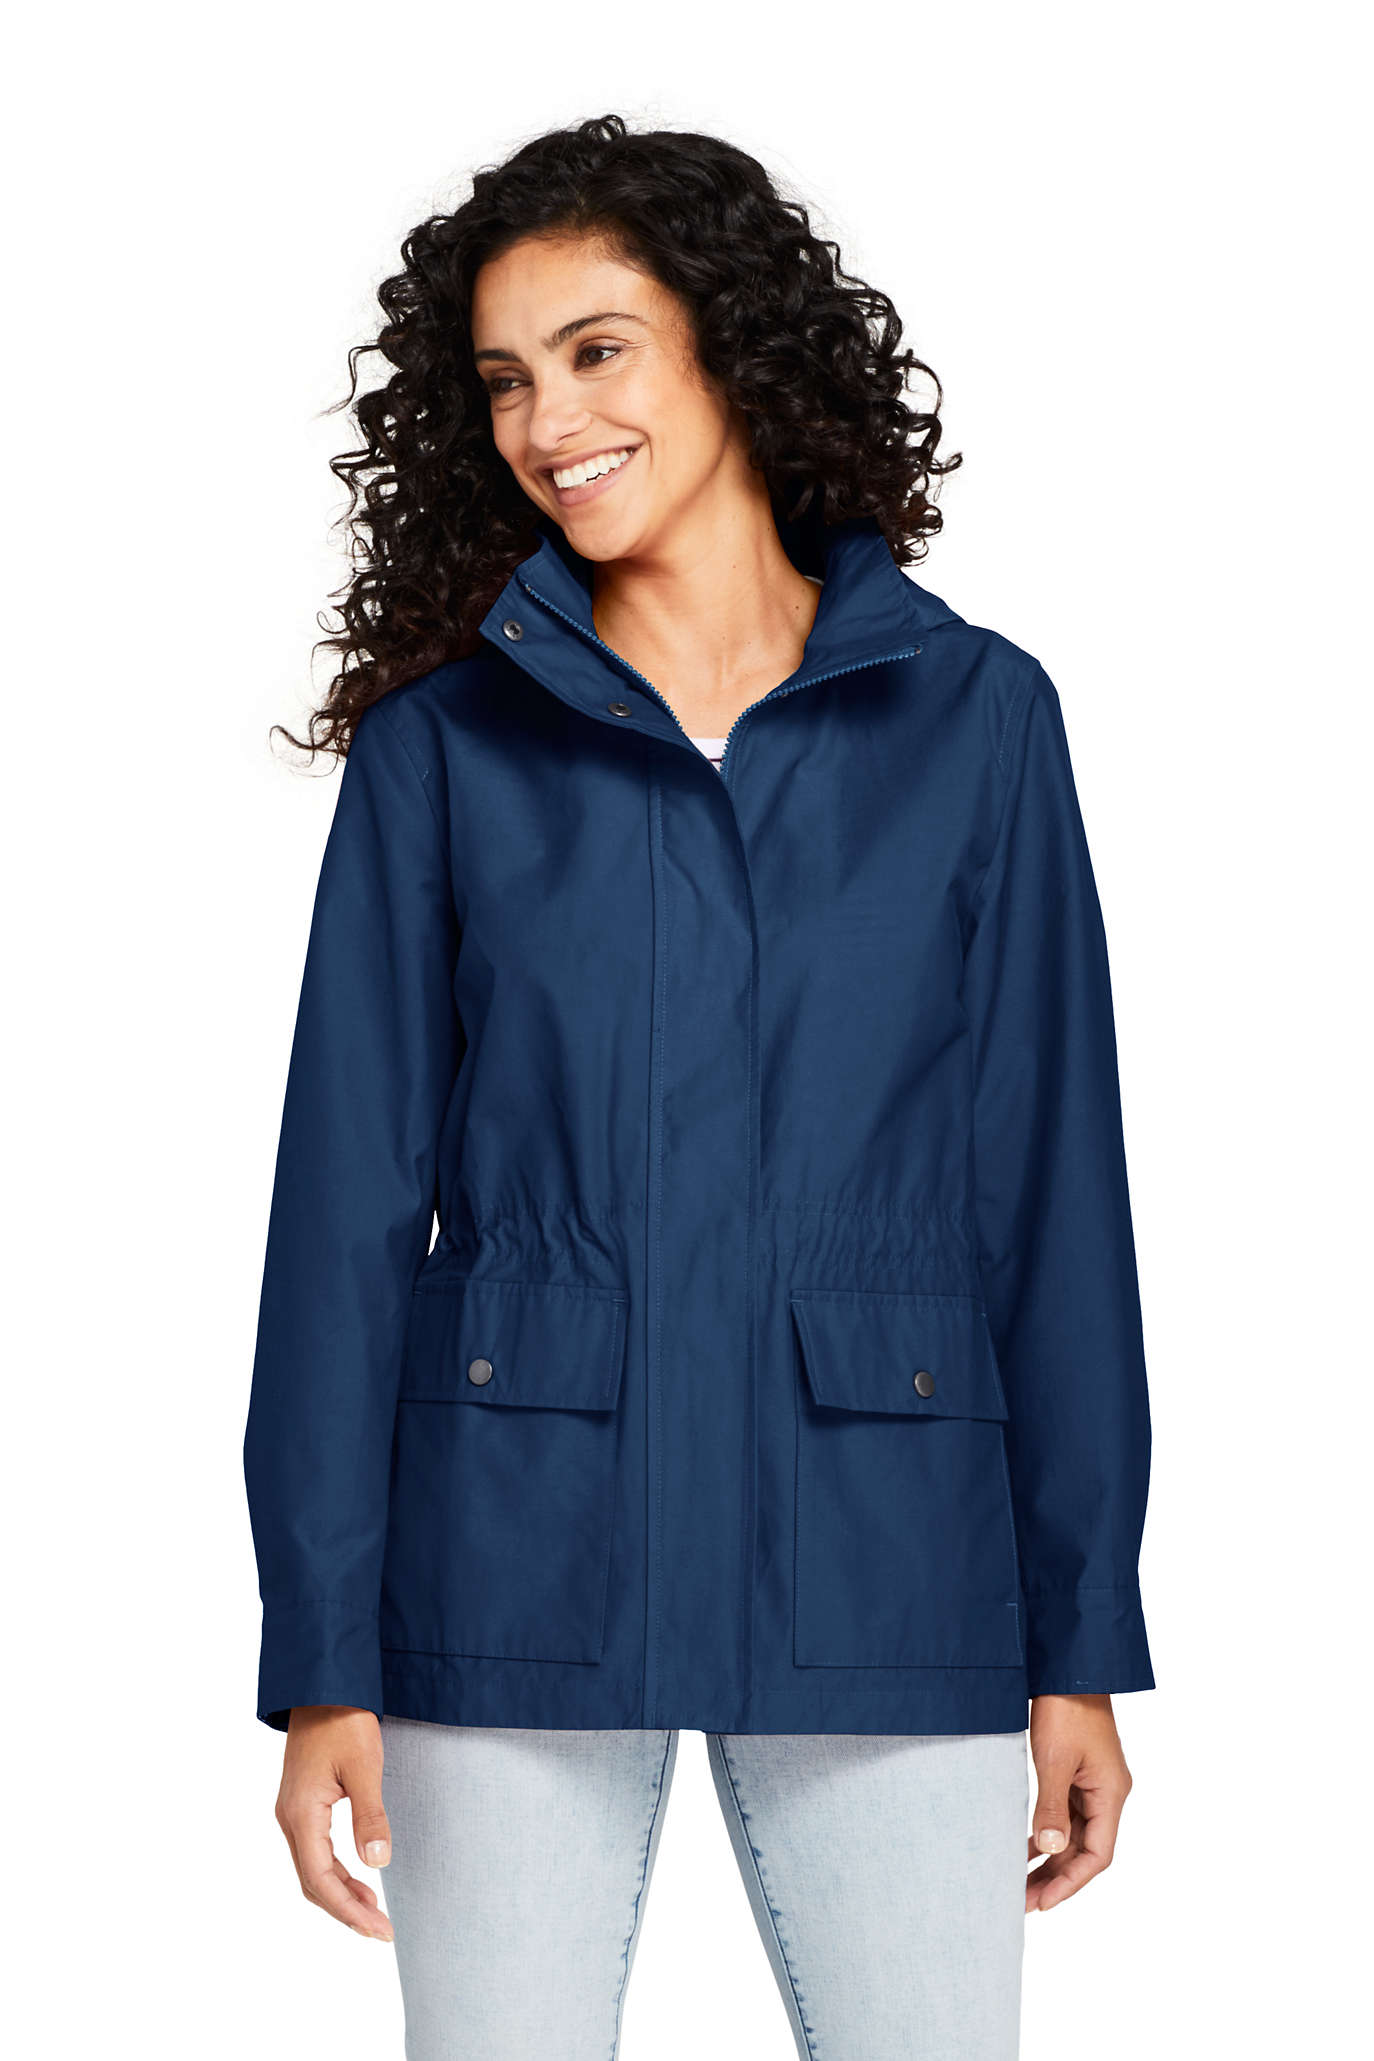 Women's Cotton Lightweight Jacket